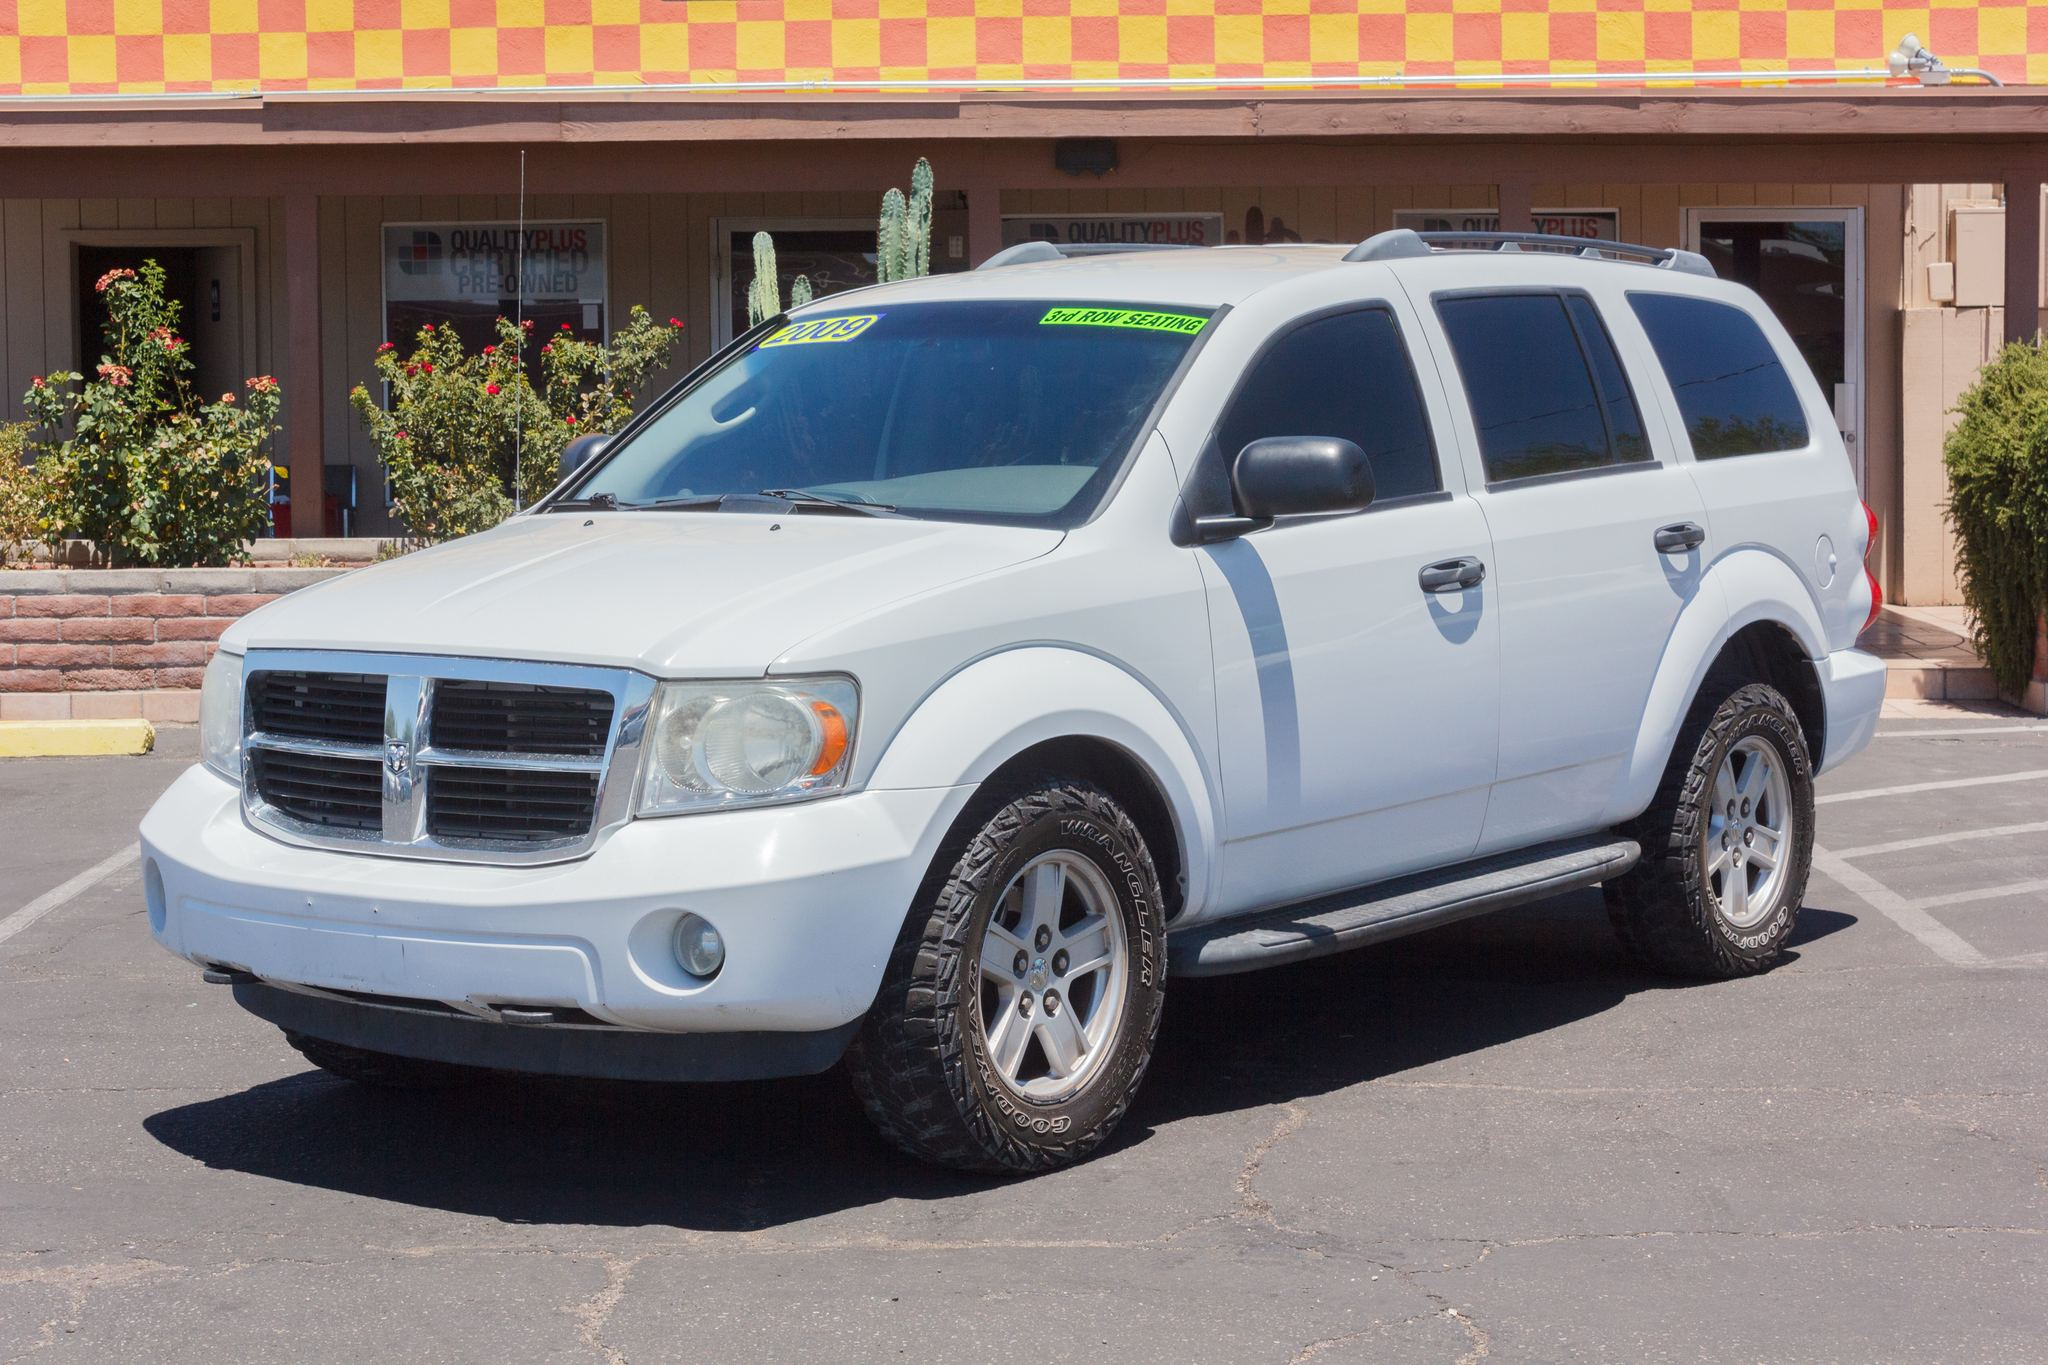 Photo of 2009 Dodge Durango 4WD 4d Wagon SE Bright White Clearcoat